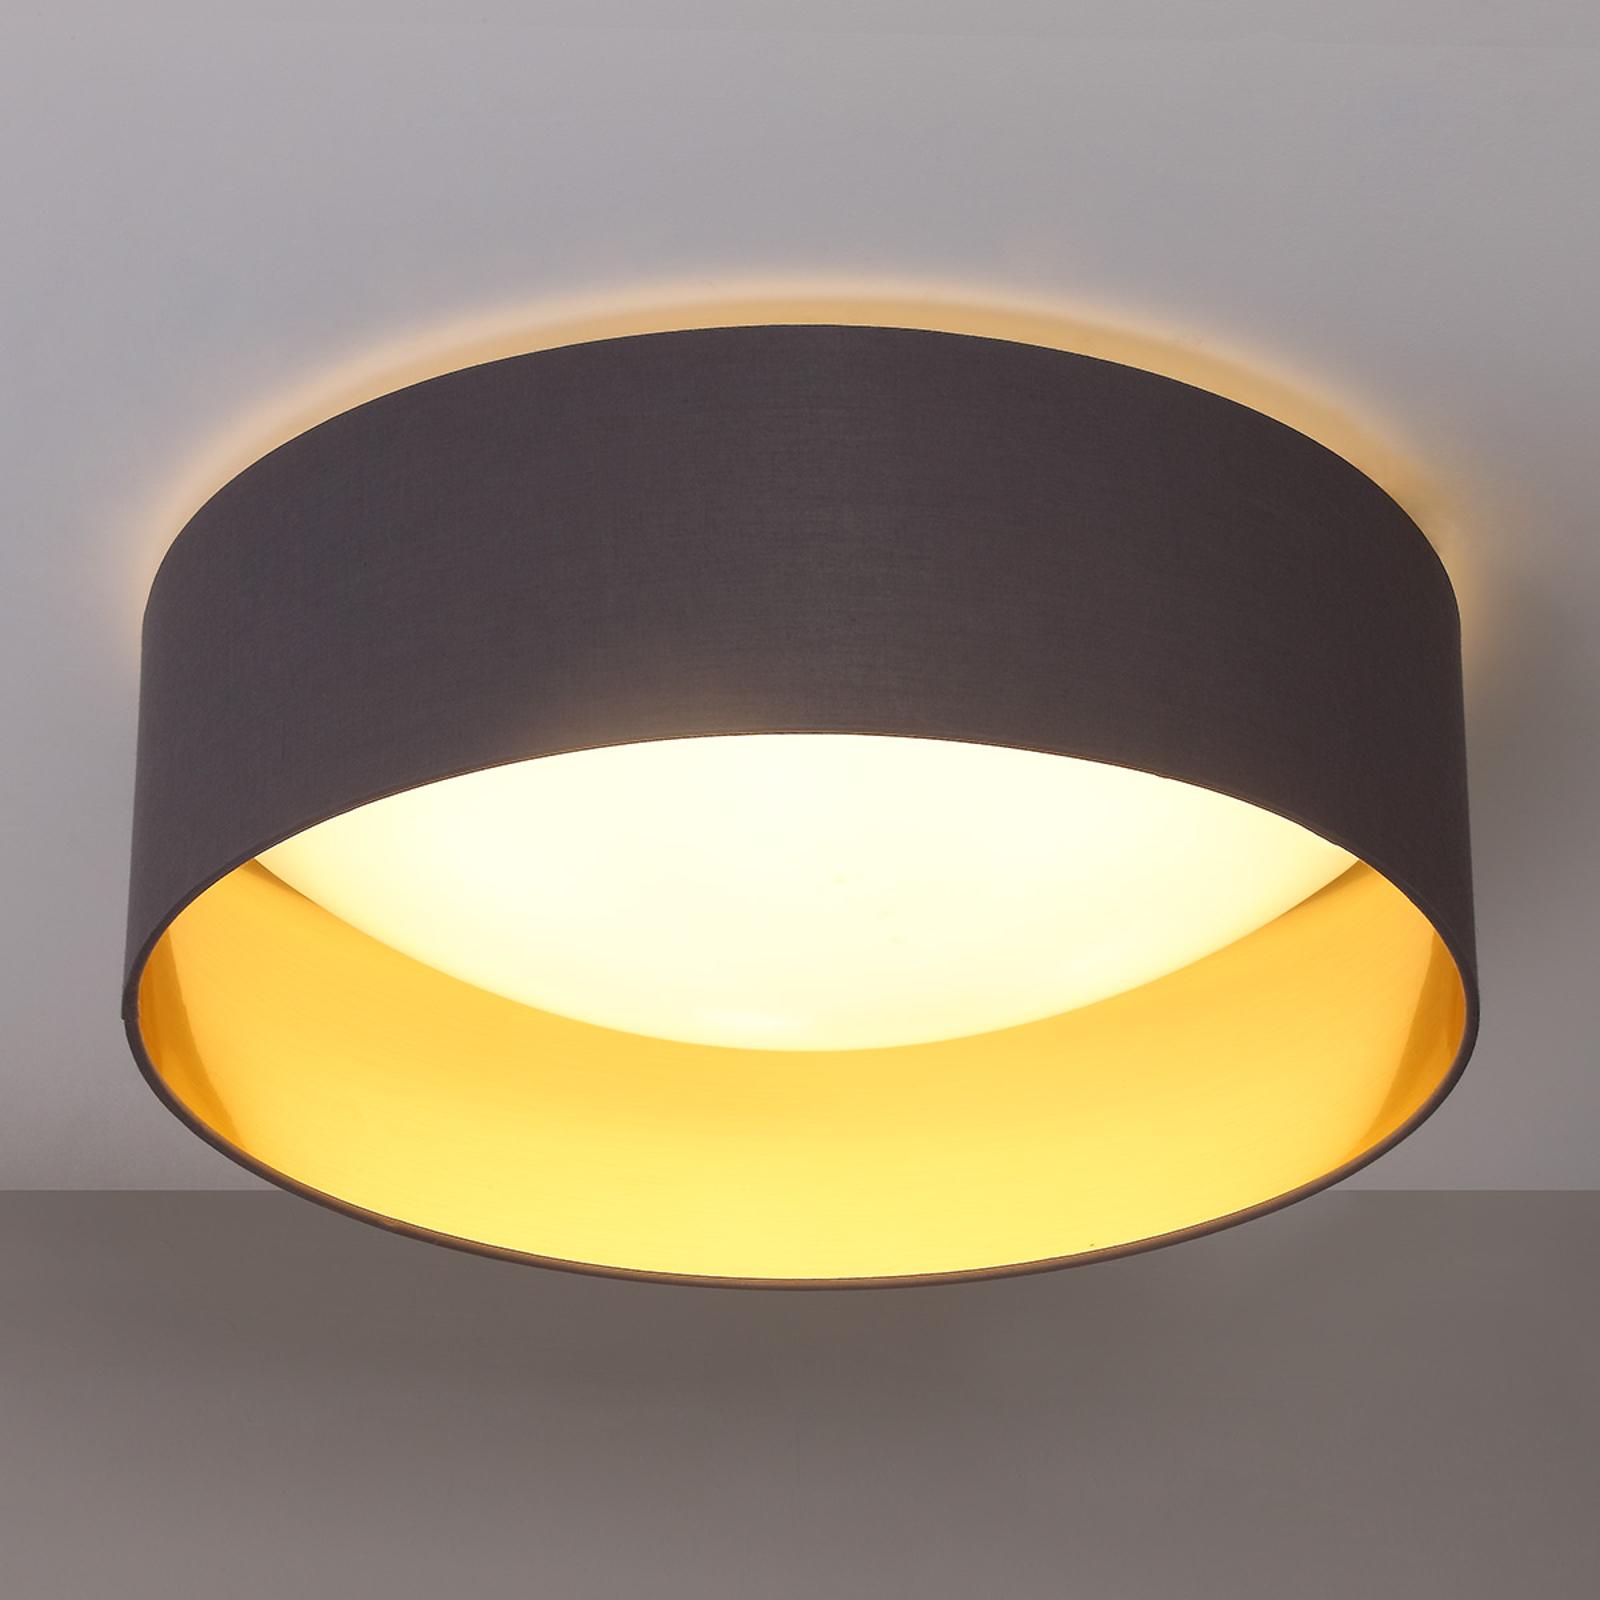 Materiałowa lampa sufitowa COLEEN, szara